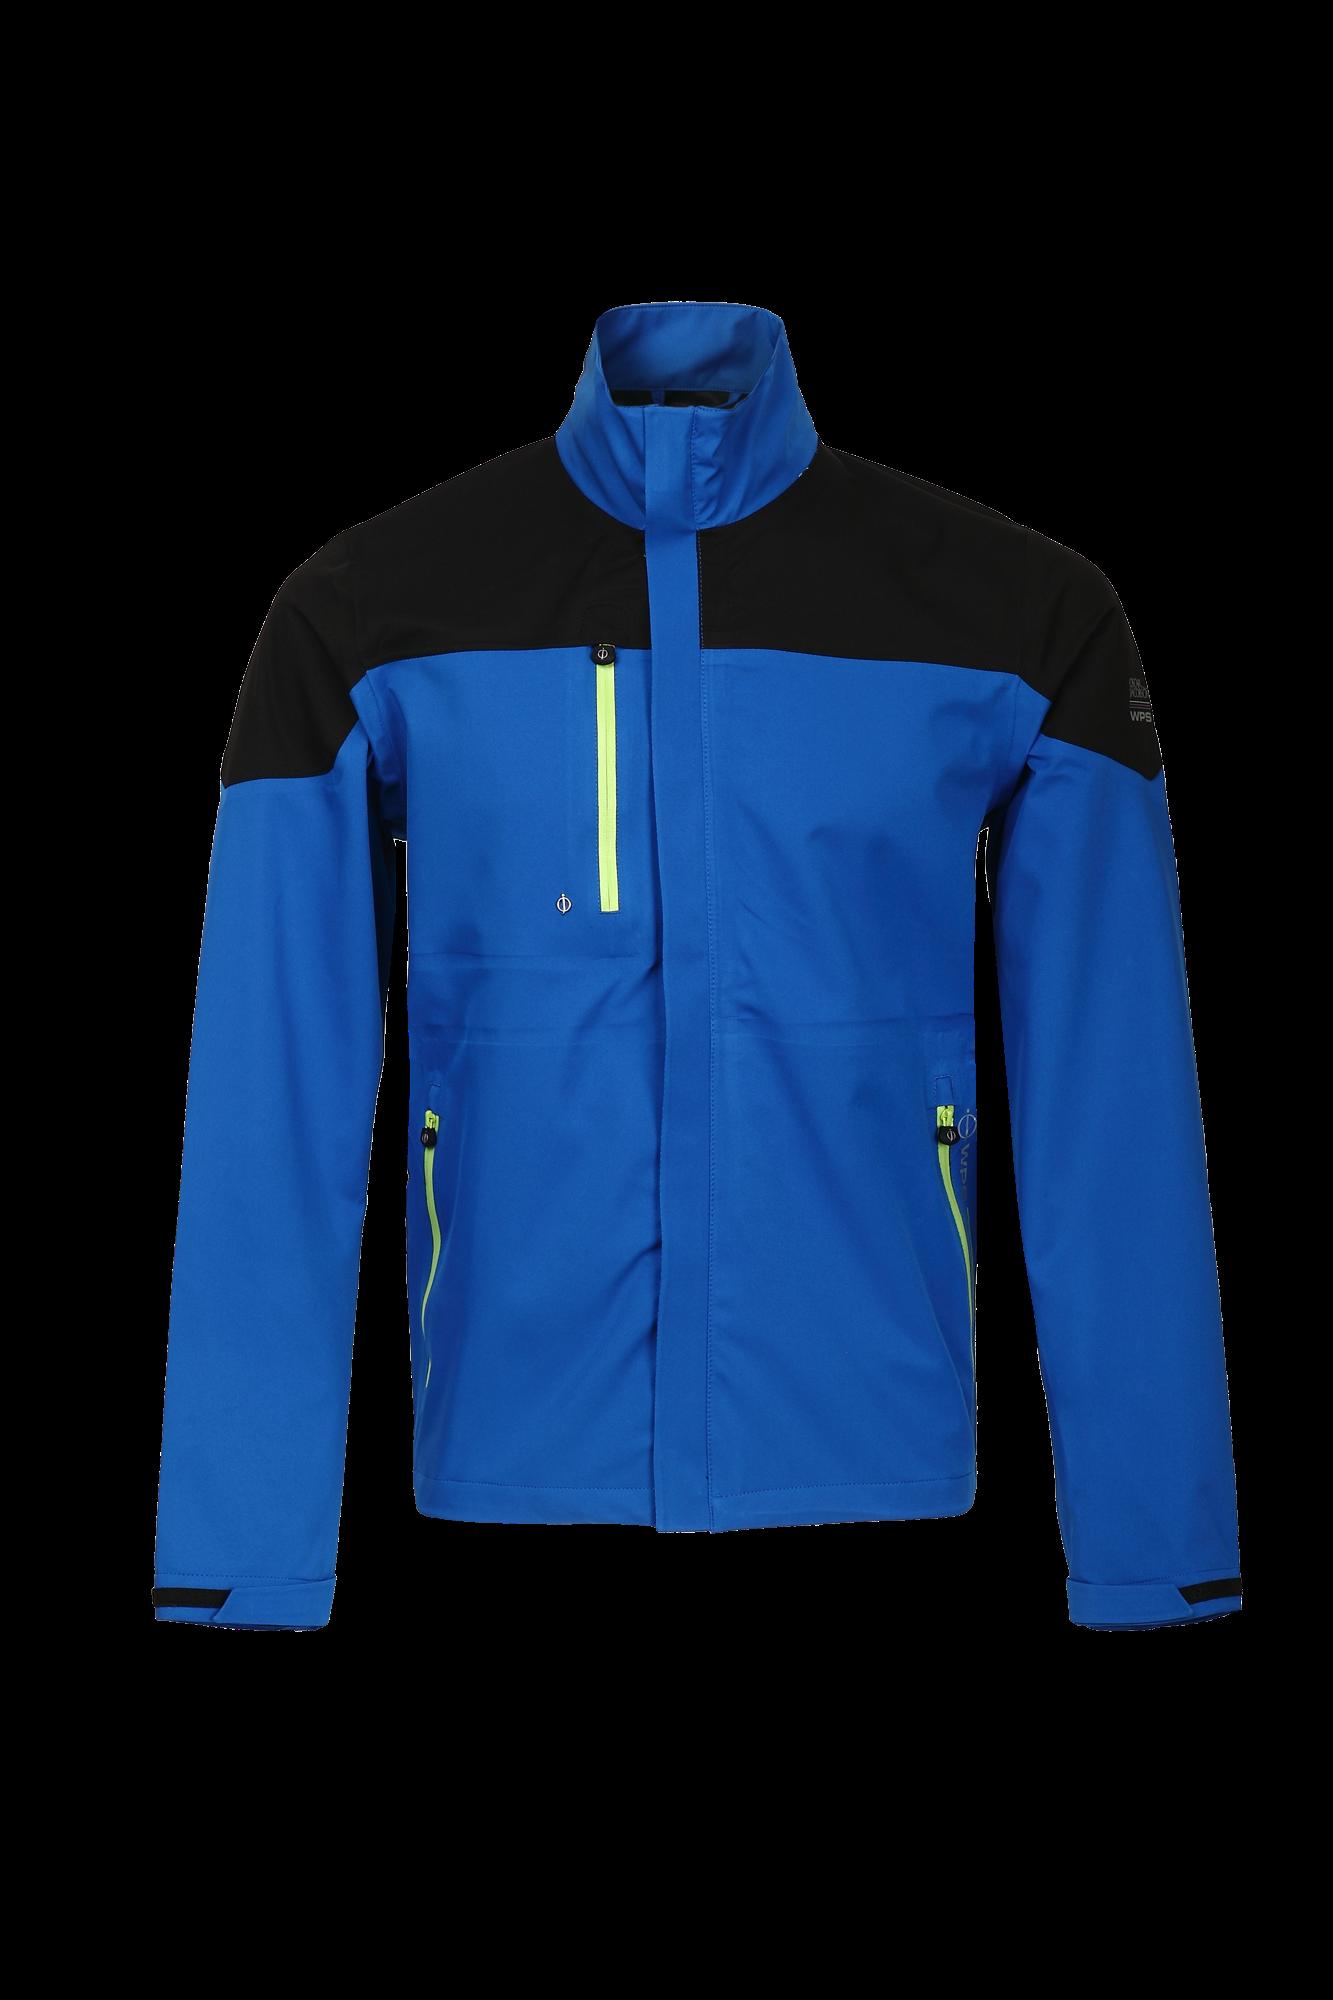 Top 6 Waterproof Jackets